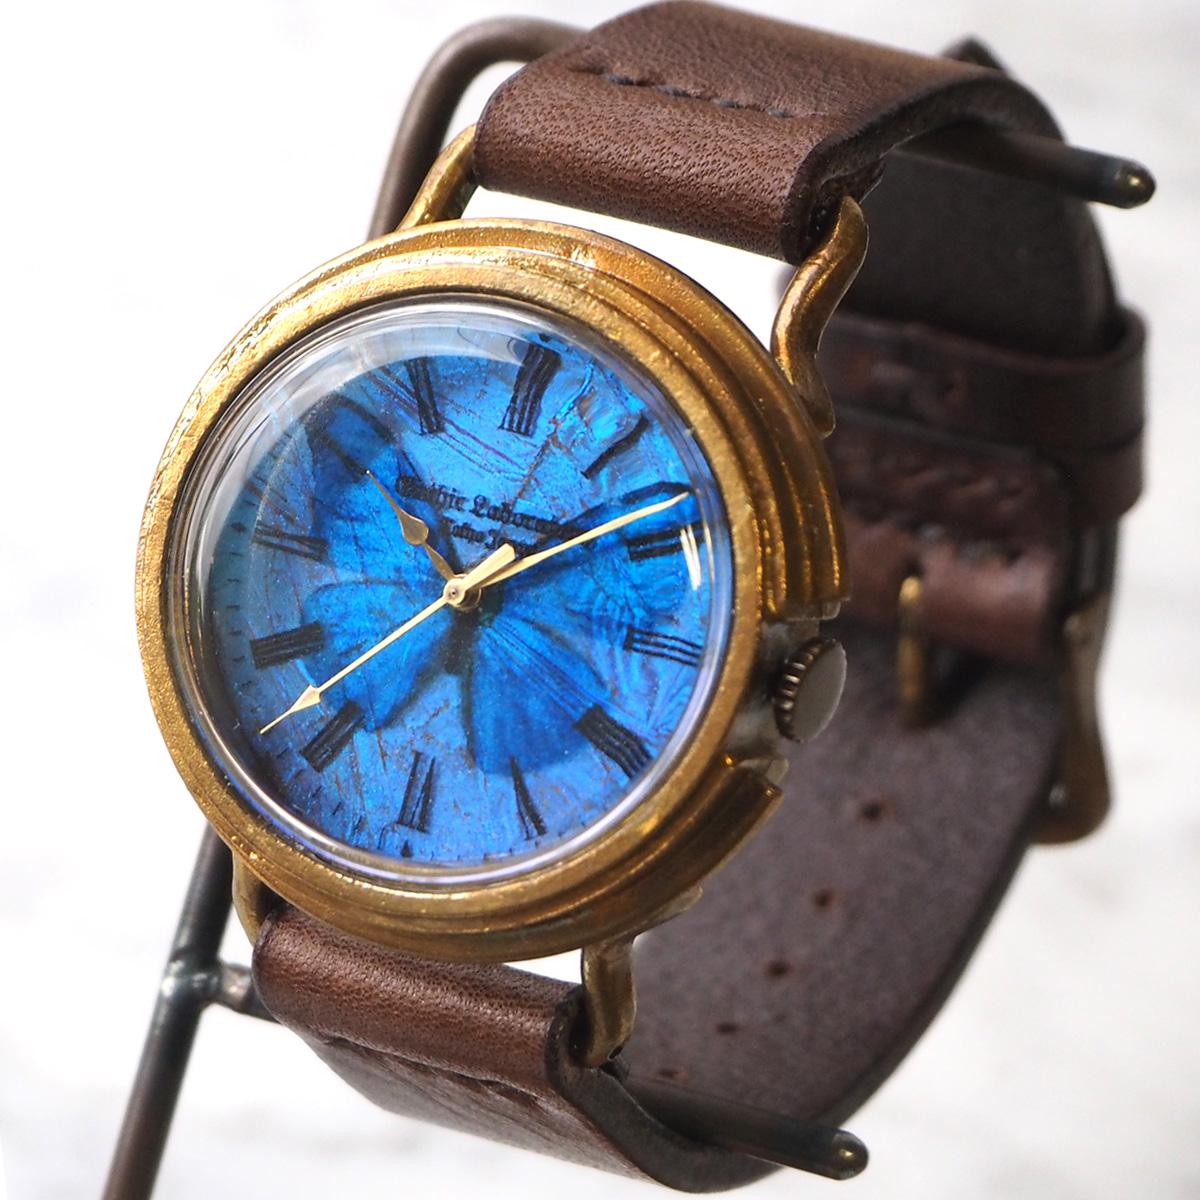 "Gothic Laboratory(ゴシックラボラトリー) 手作り腕時計 ""リアルモルフォ"" -本物の青い蝶の翅- 真鍮 Lサイズ [GL-CW-RM-BR-L]"